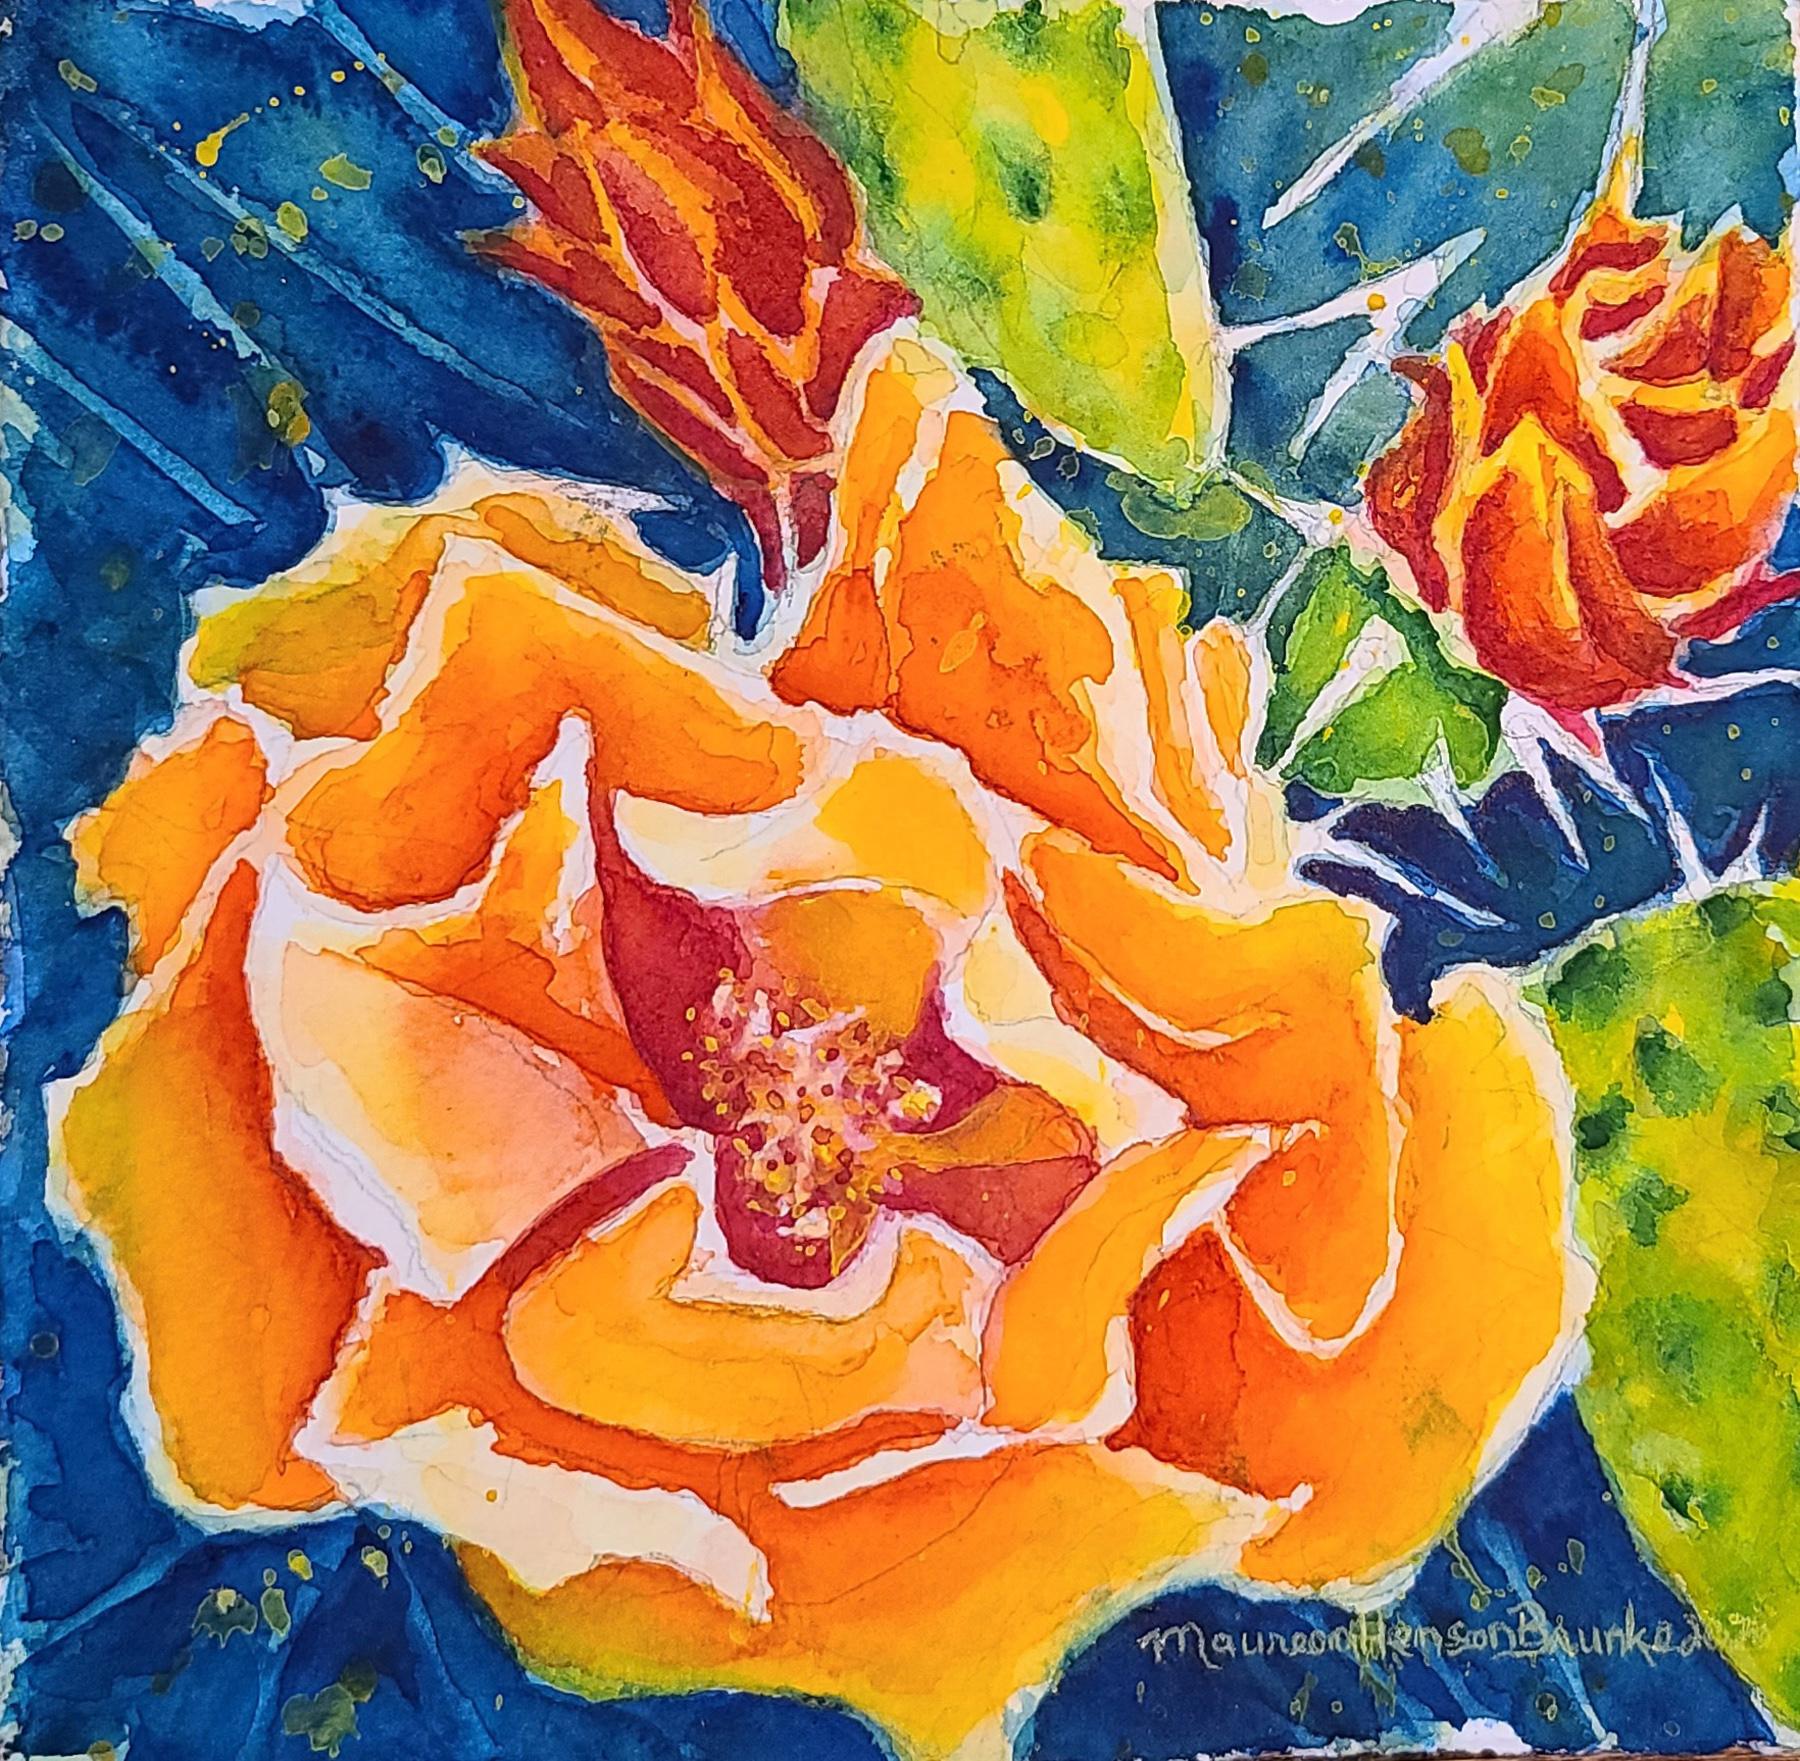 Desert Bloom 2 by  Maureen Henson-Brunke - Masterpiece Online